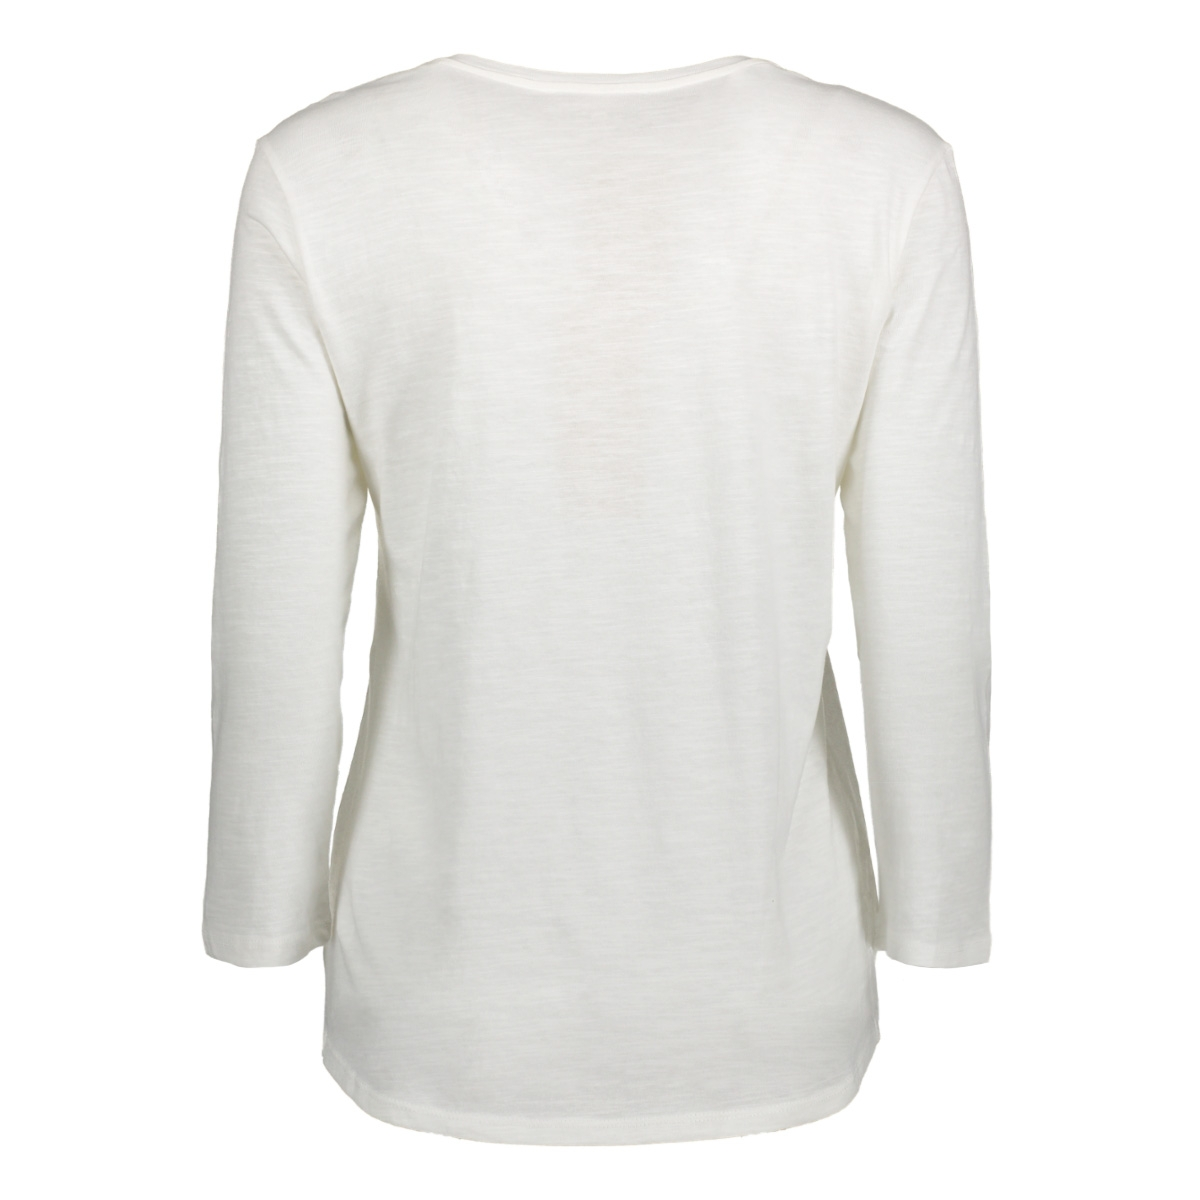 1055107.00.71 tom tailor t-shirt 8005